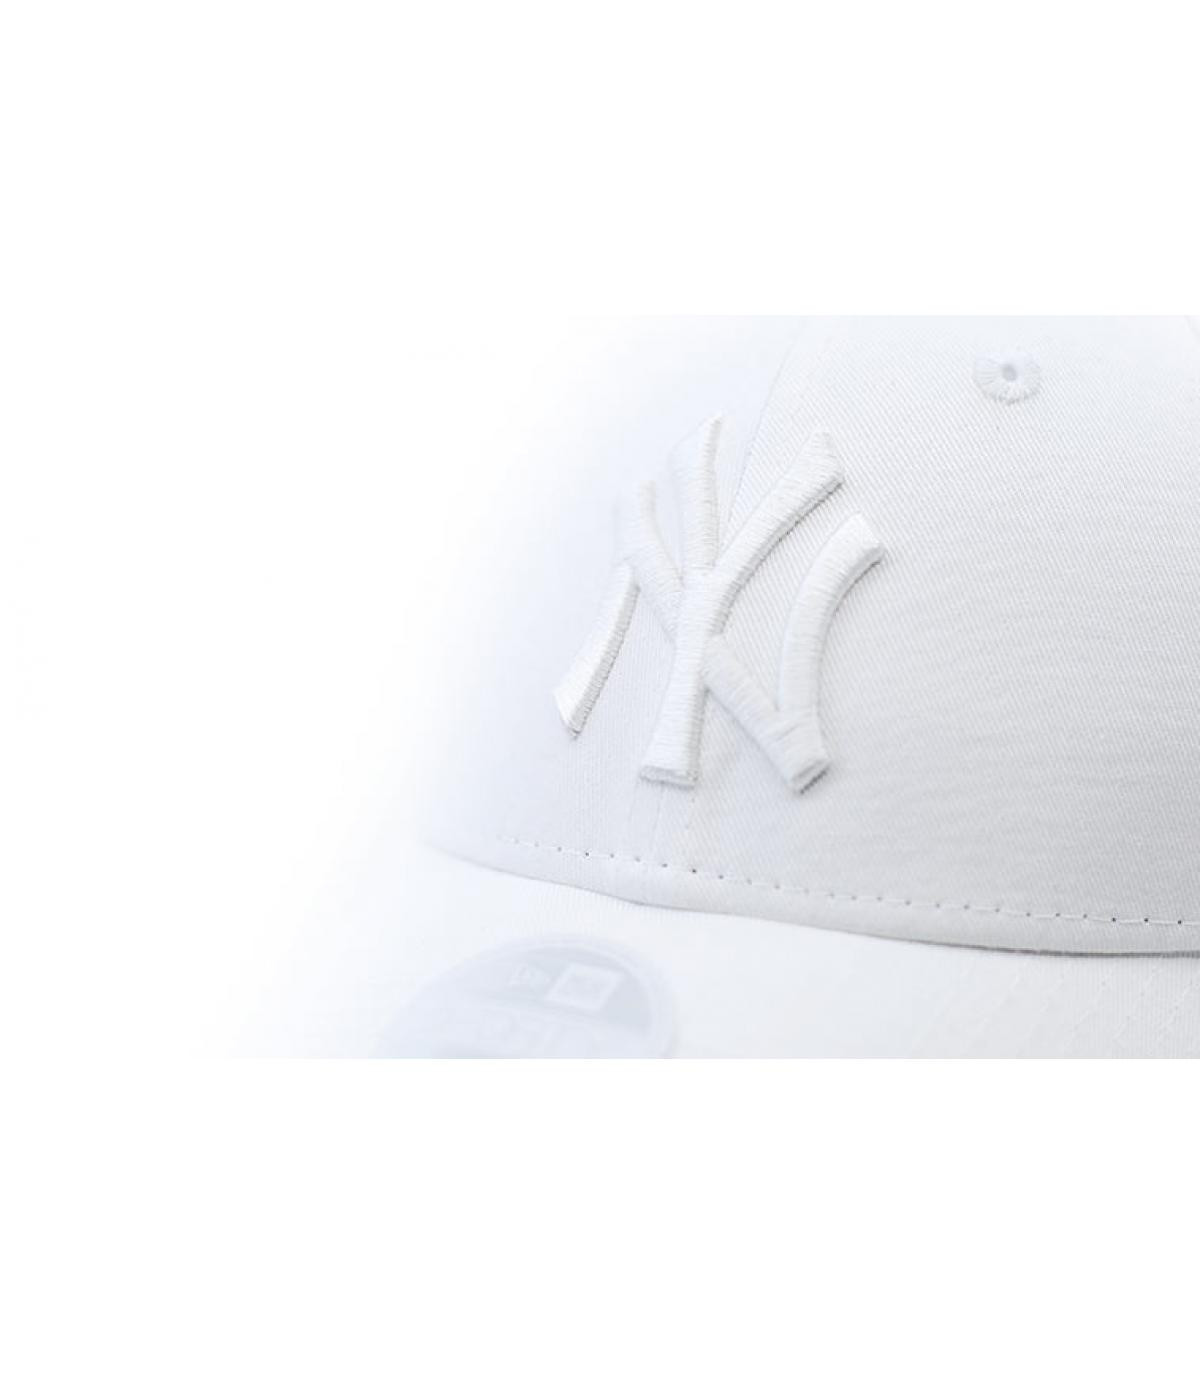 Details Casquette Wmns League Ess NY white - Abbildung 3